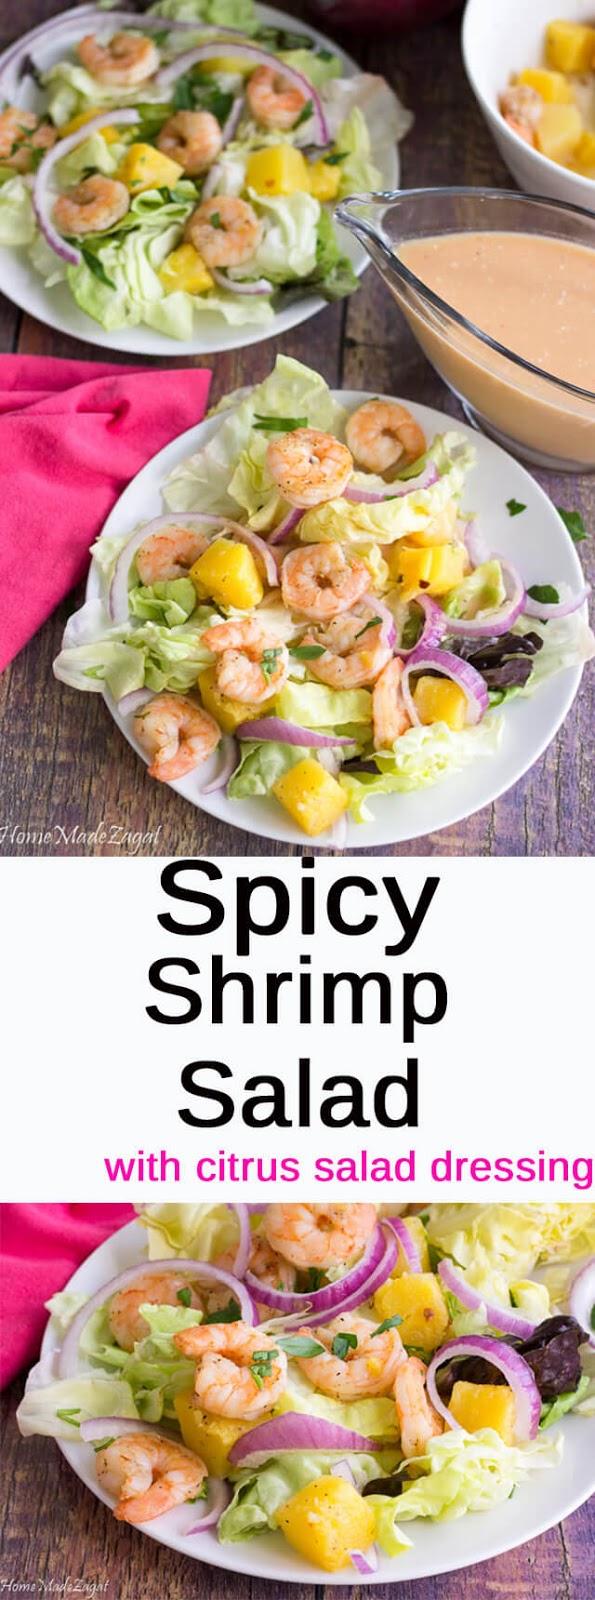 Spicy Shrimp Salad - the perfect summer salad